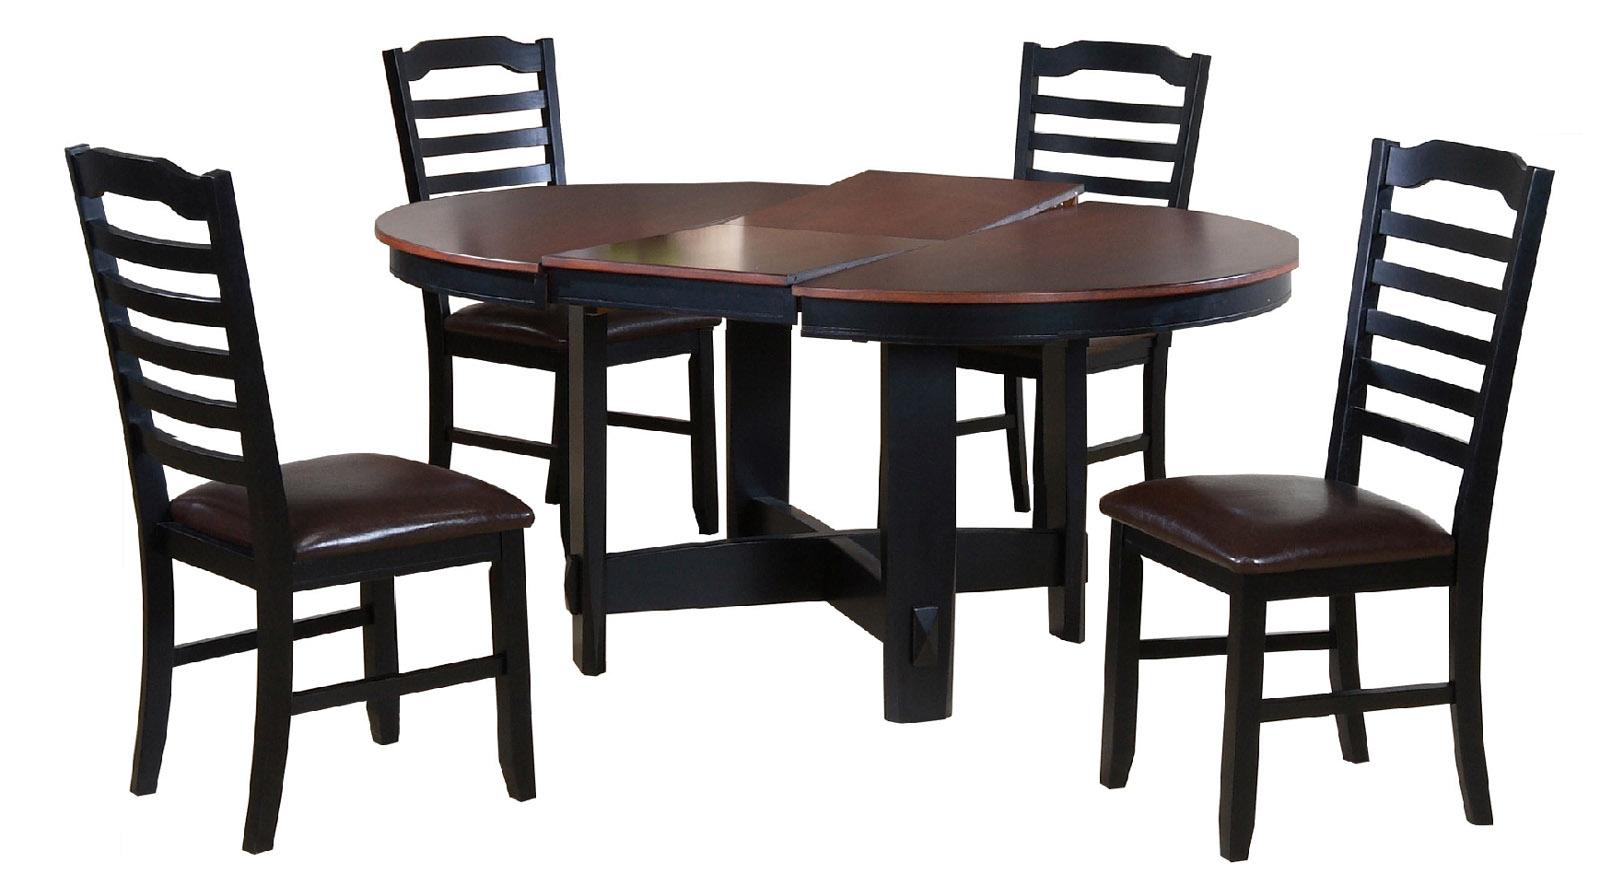 Casual dining room table decor modern art design for Casual dining table decor